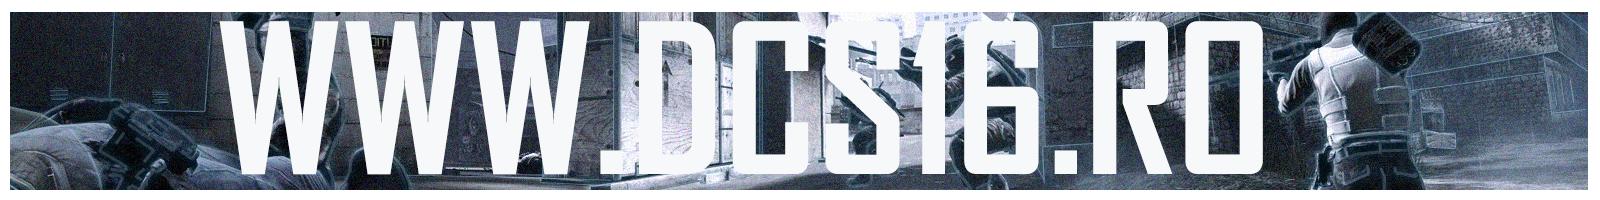 DCS16.RO Counter Strike Romania